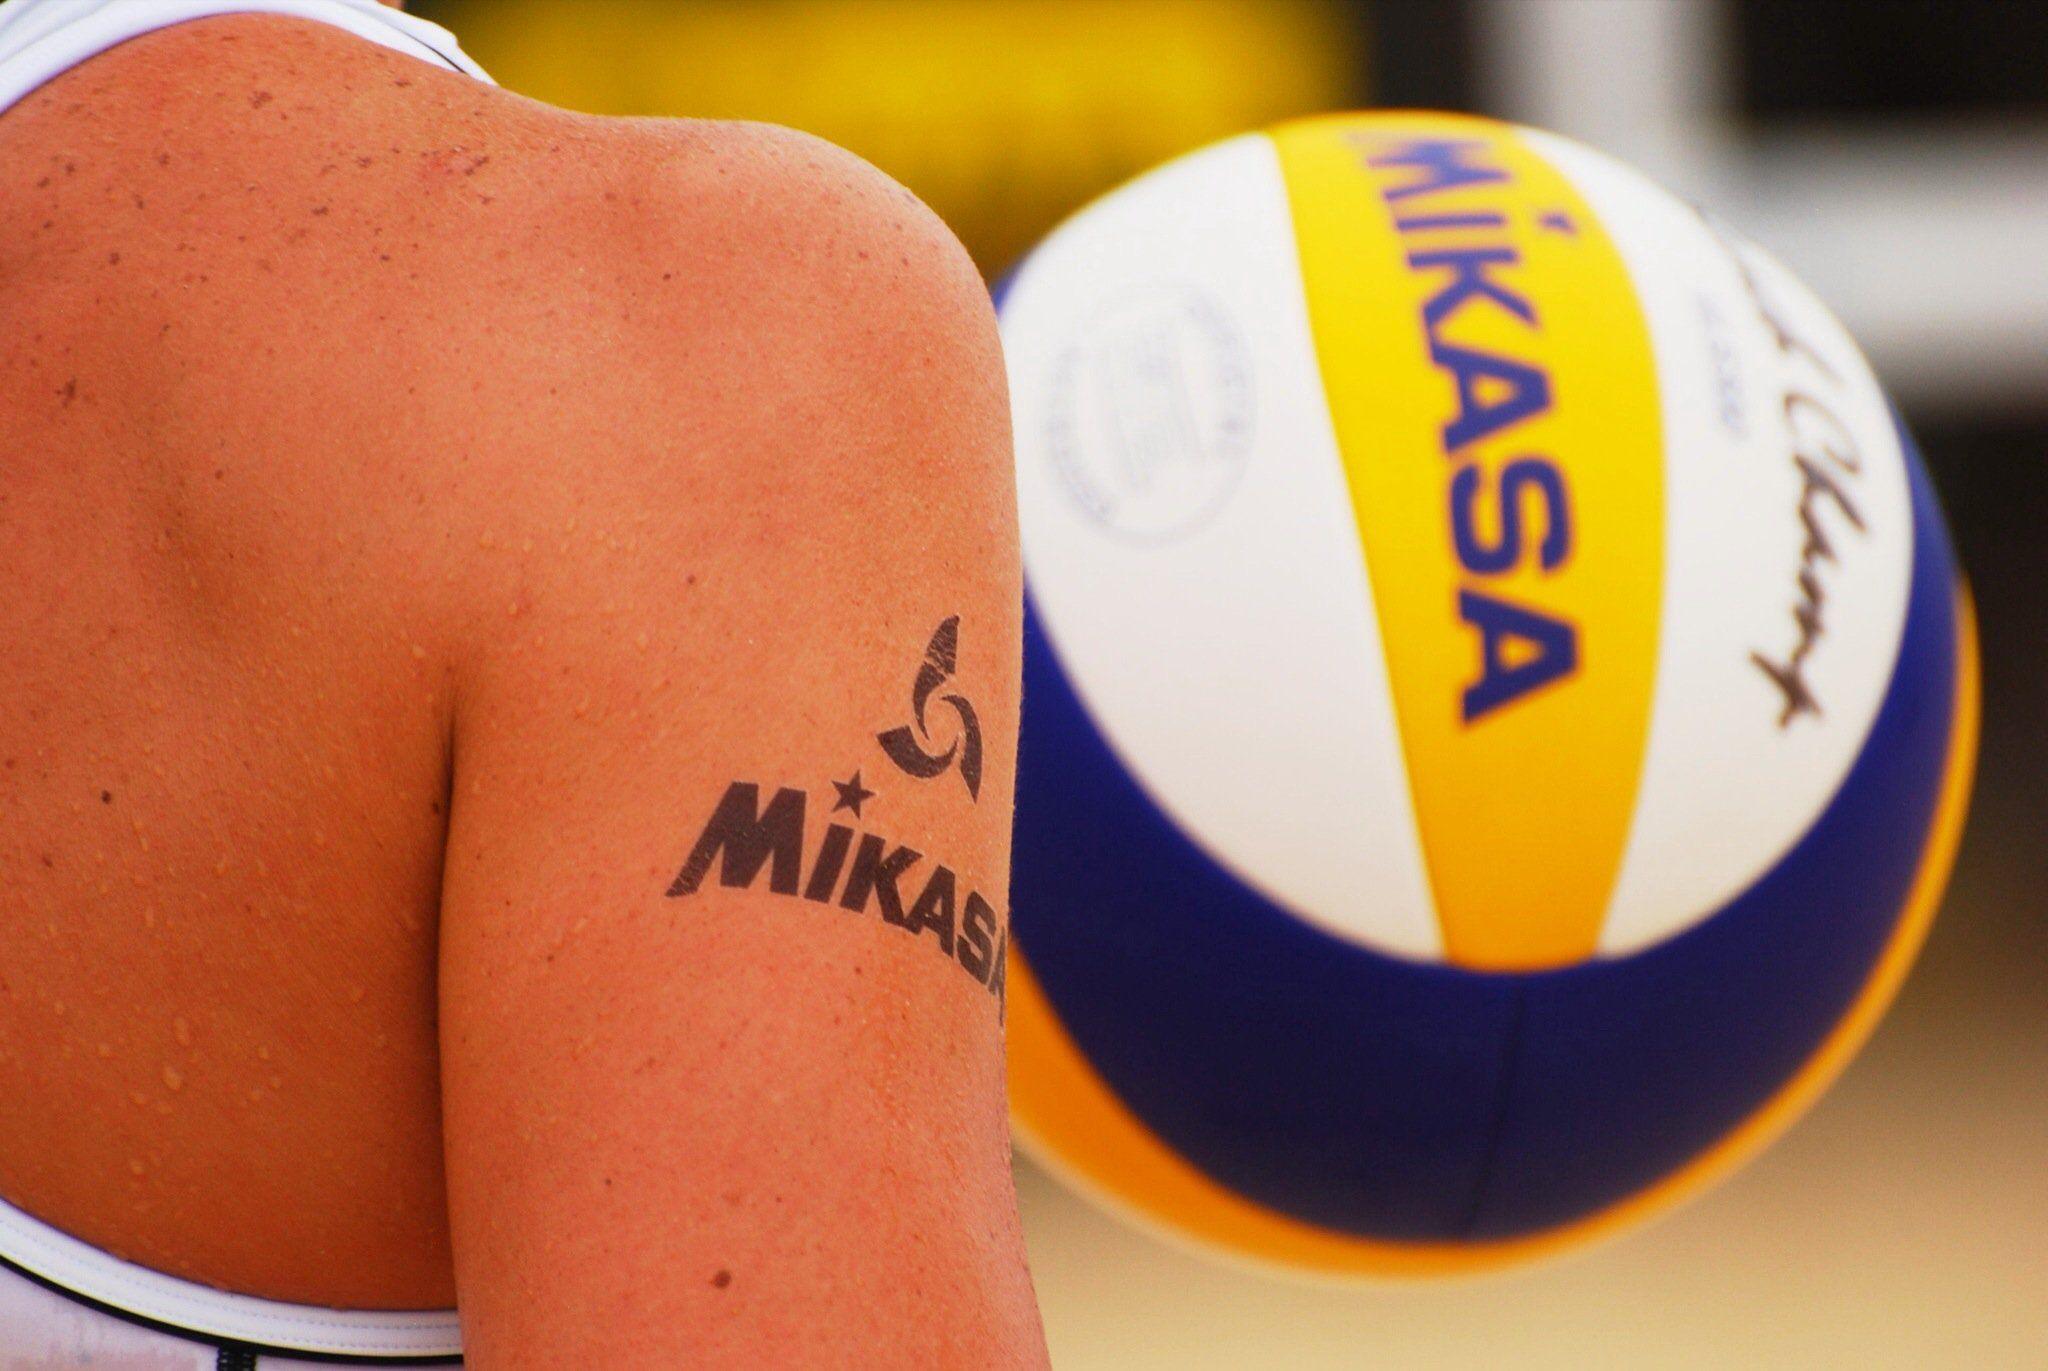 Vls300 Volleyball Beach Volleyball Sport